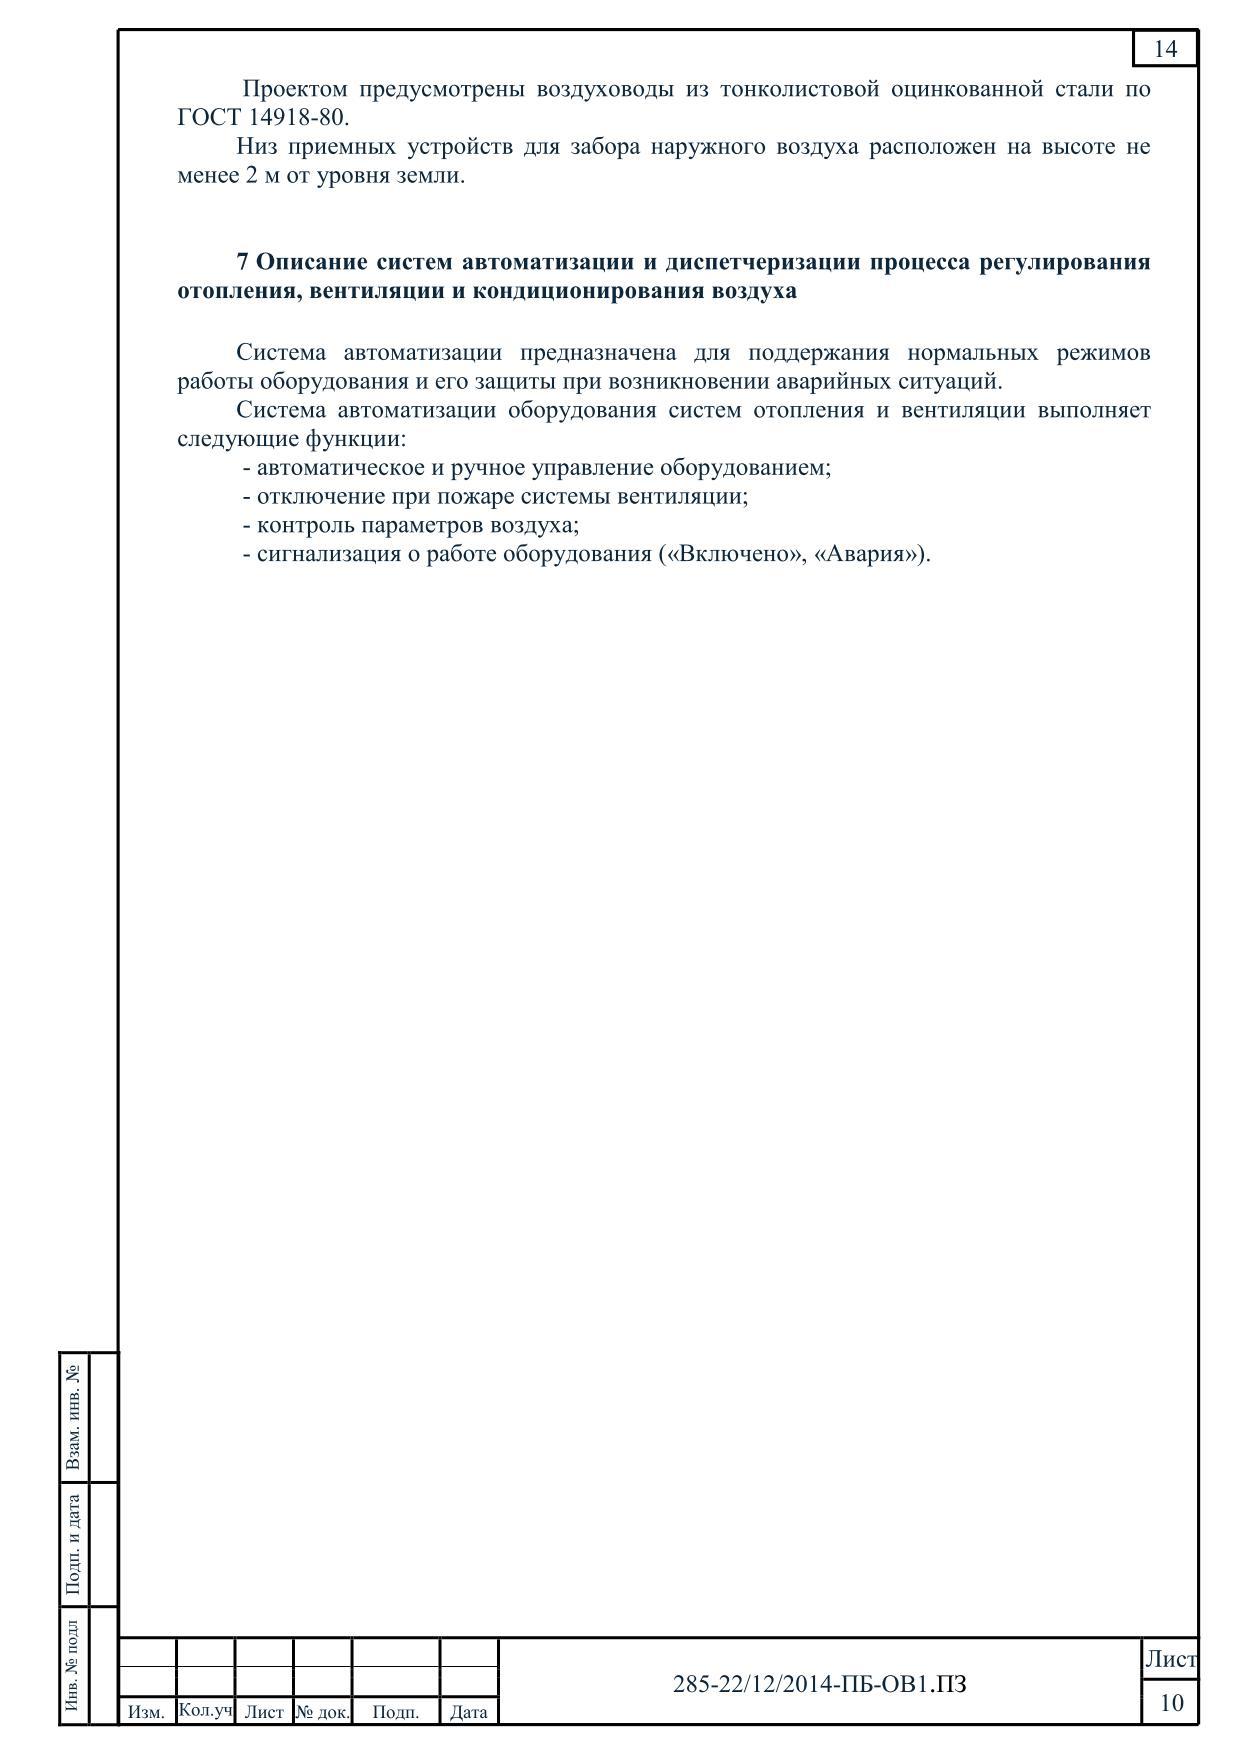 Депо 12-37-4311